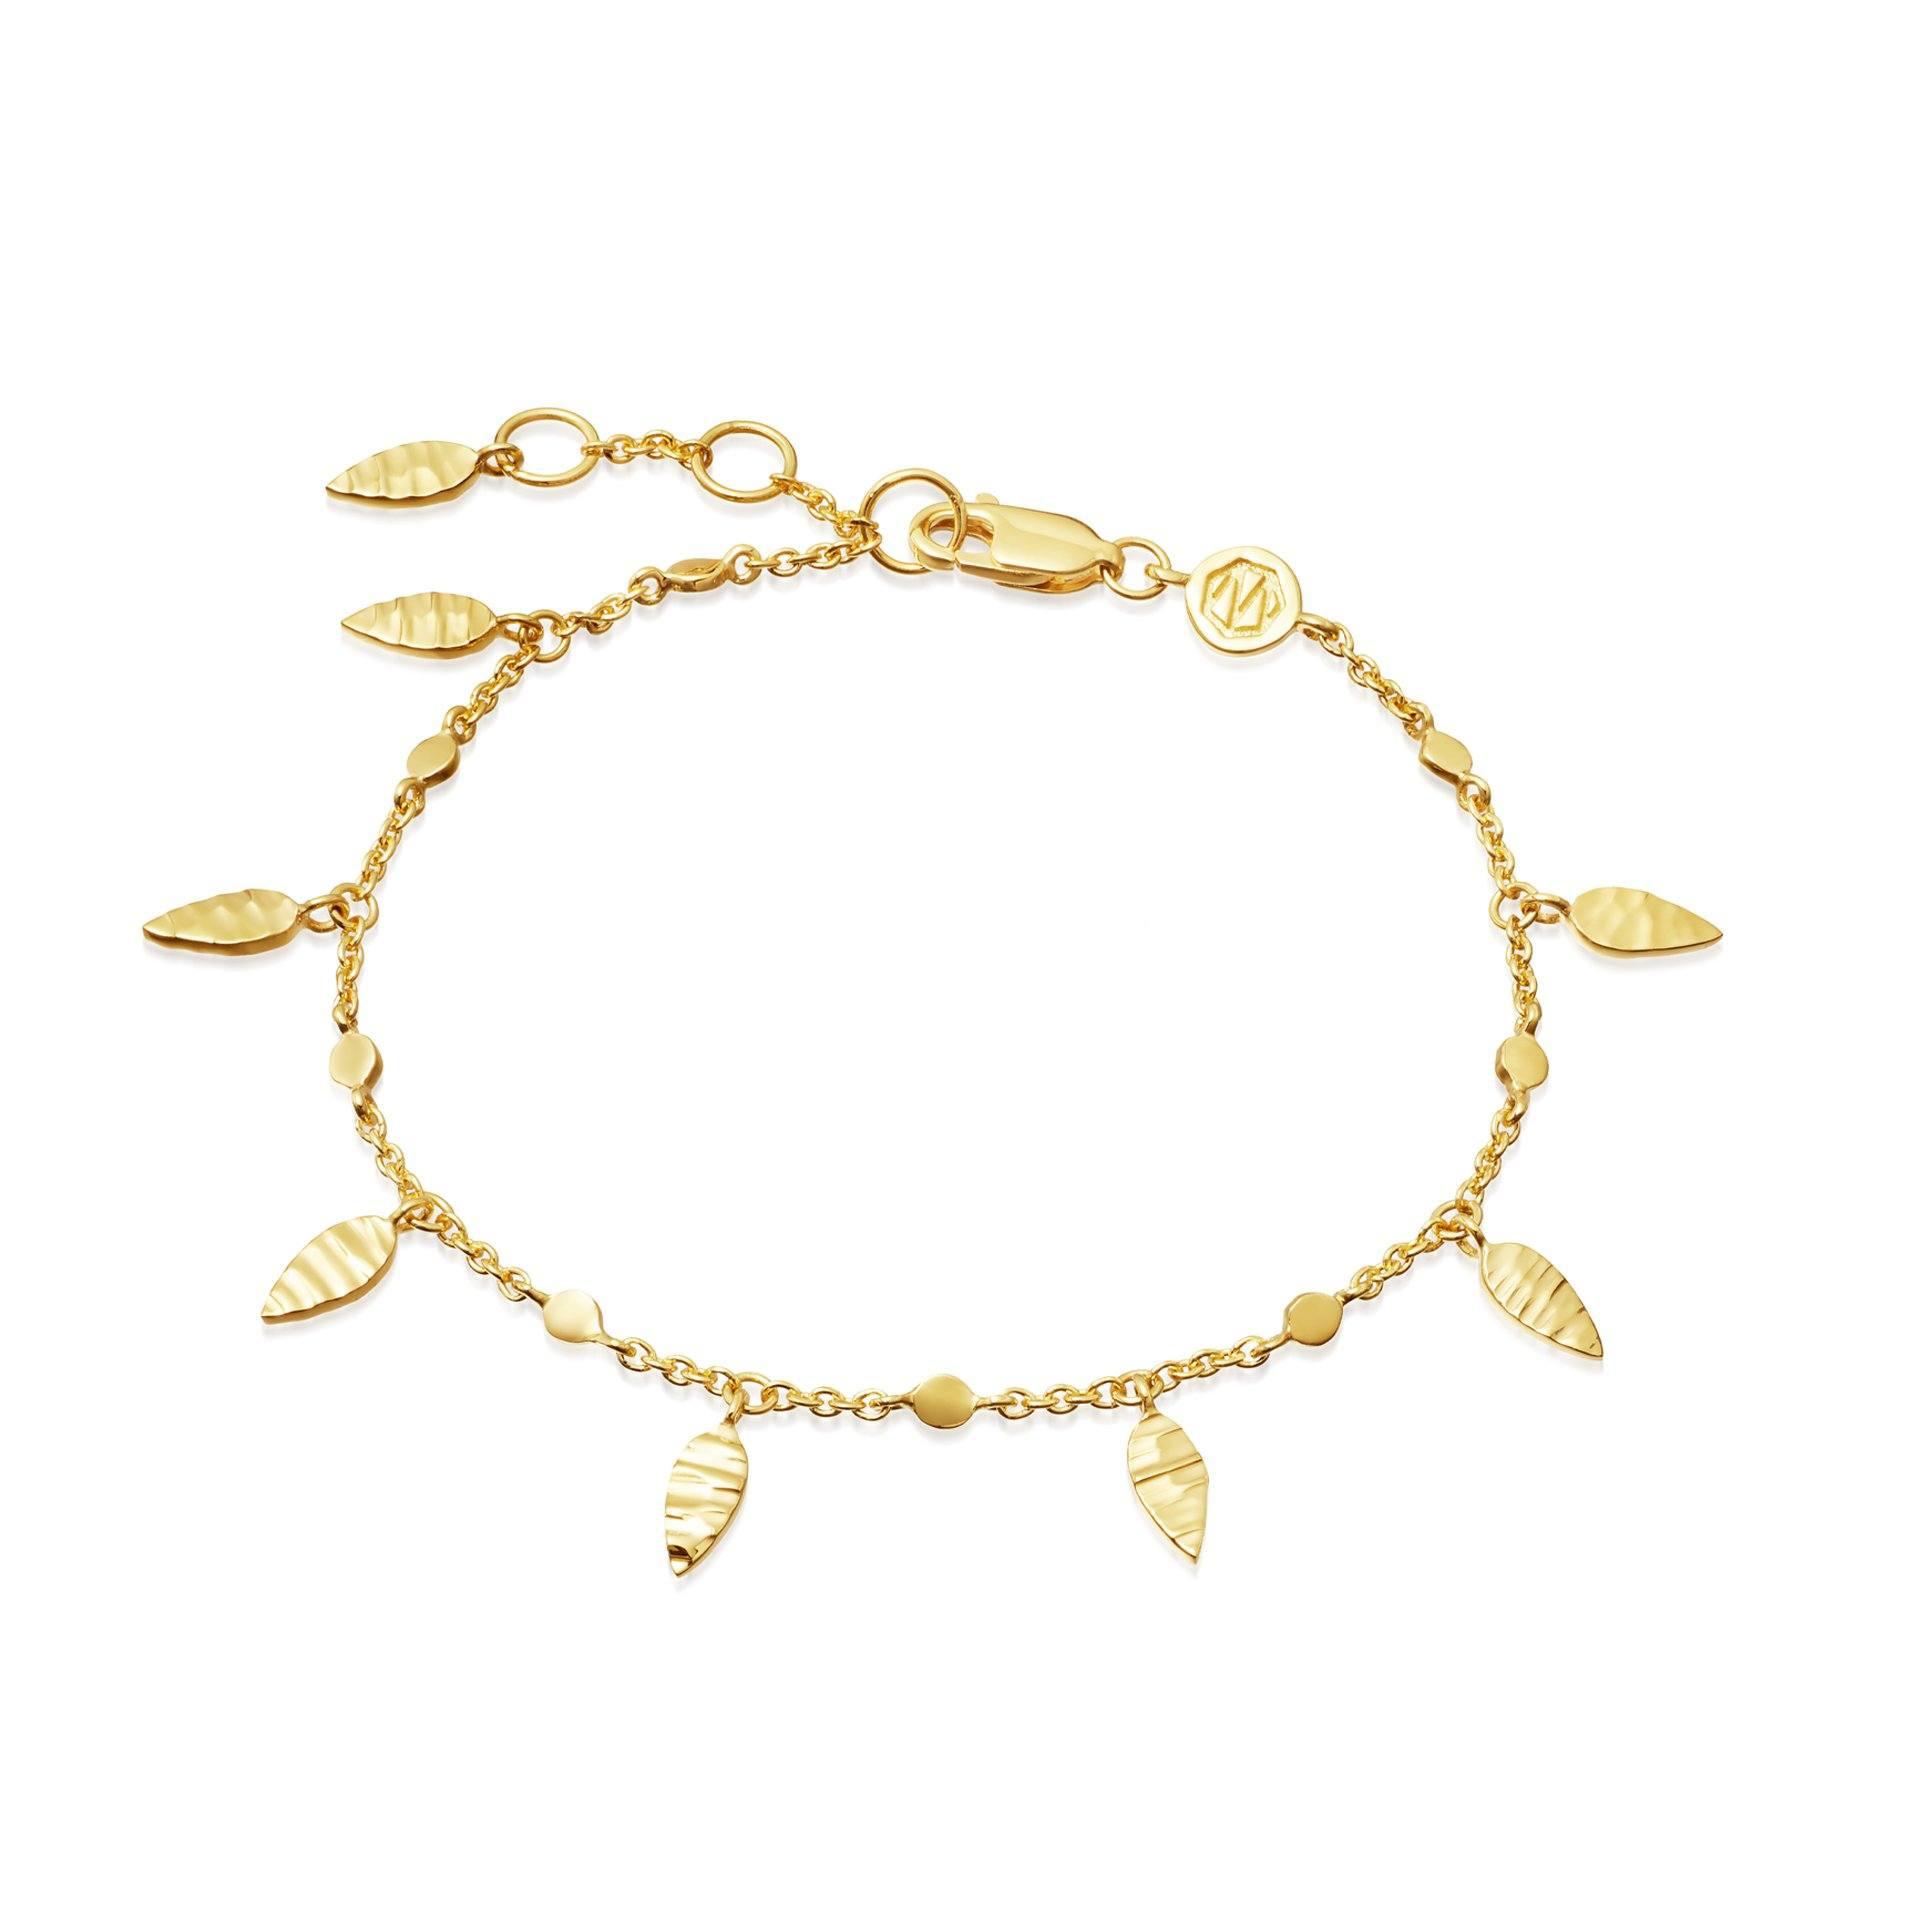 Wholesale oem 18ct Gold leaf bracelet Vermeil on Sterling Silver OEM/ODM Jewelry personalised custom design service